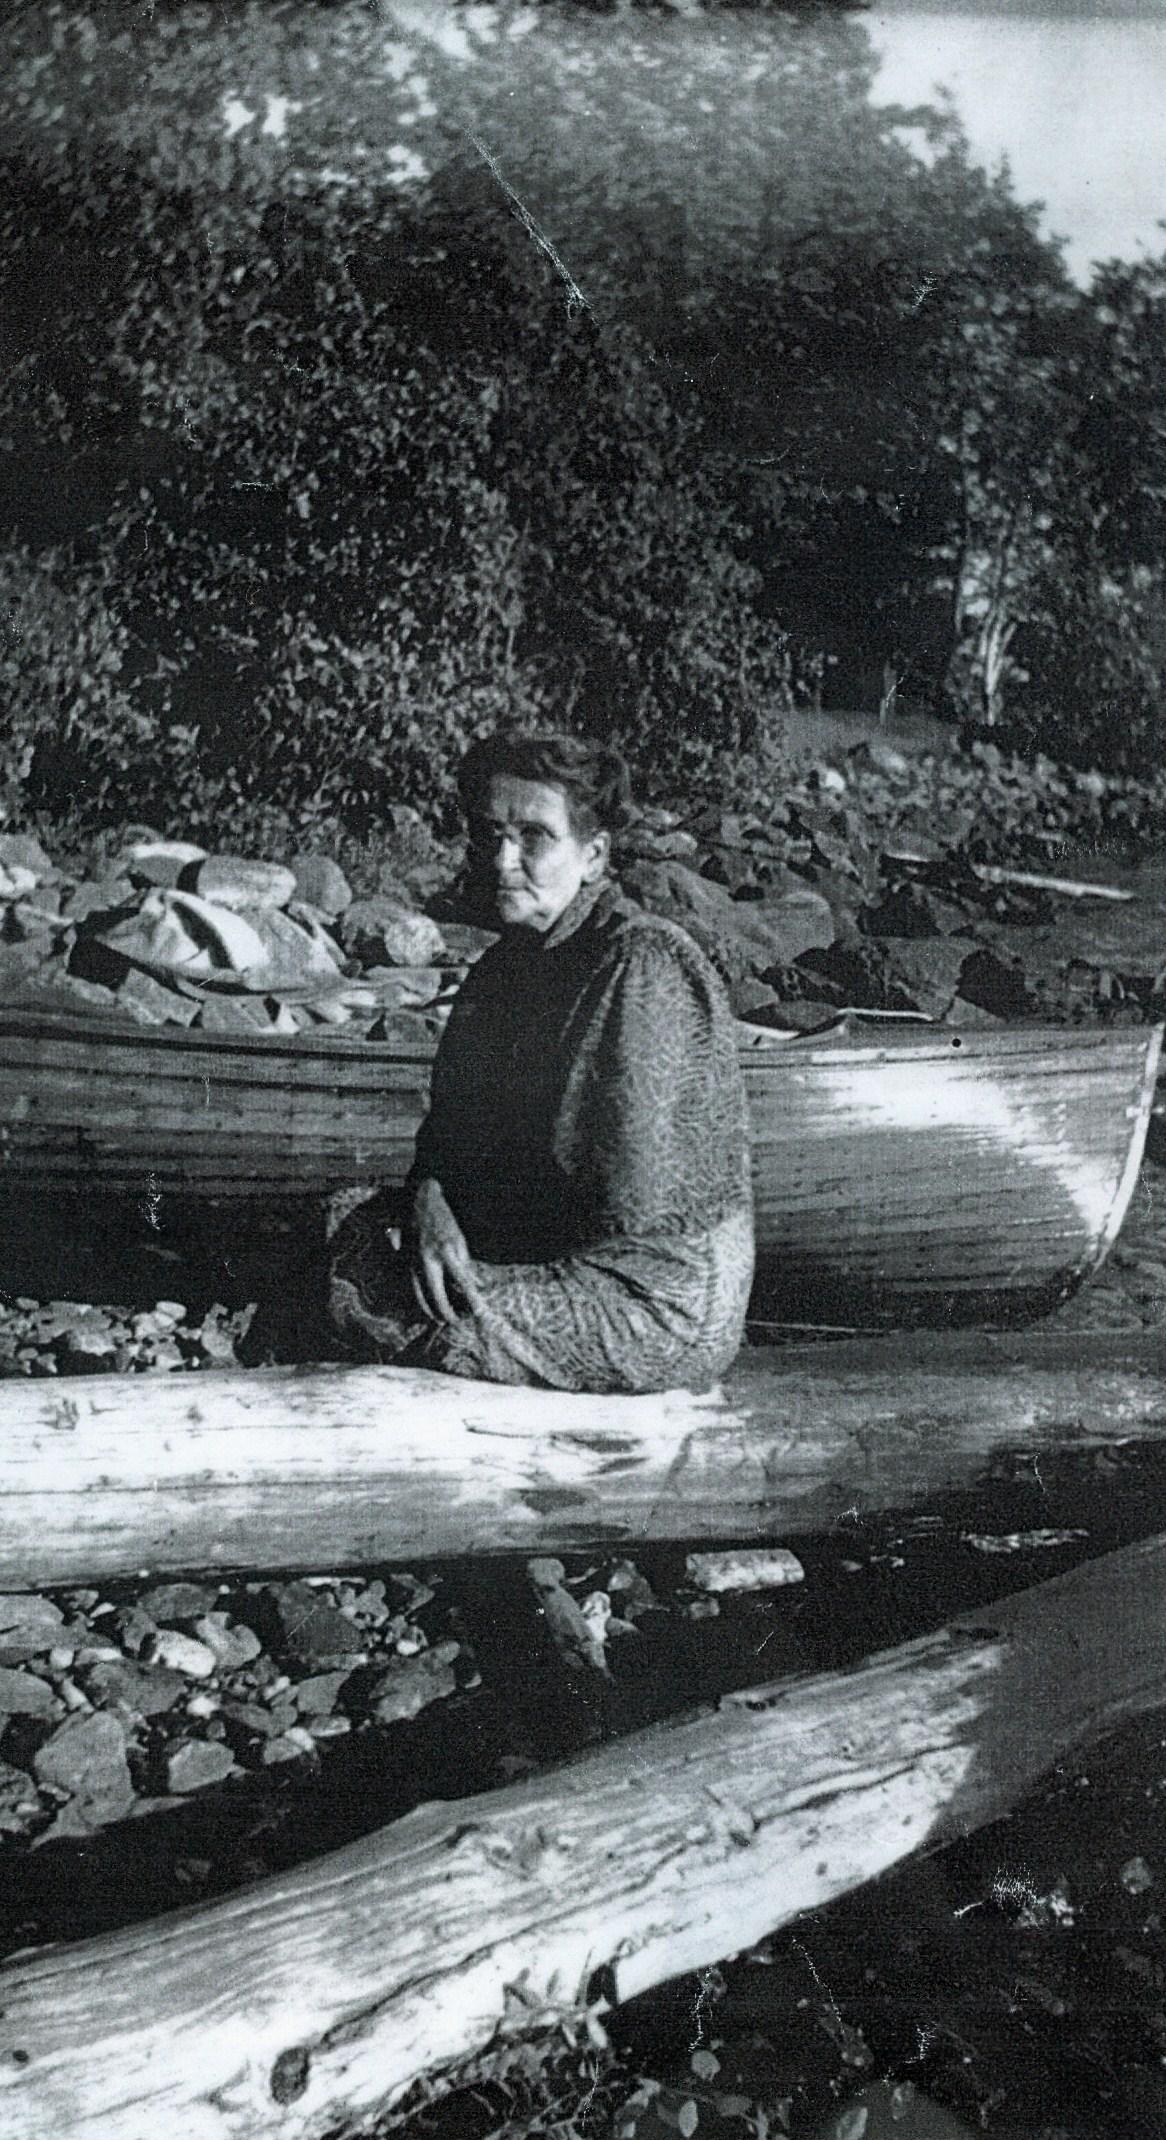 Elizabeth Gaffney, Bonter boat in background c.1936